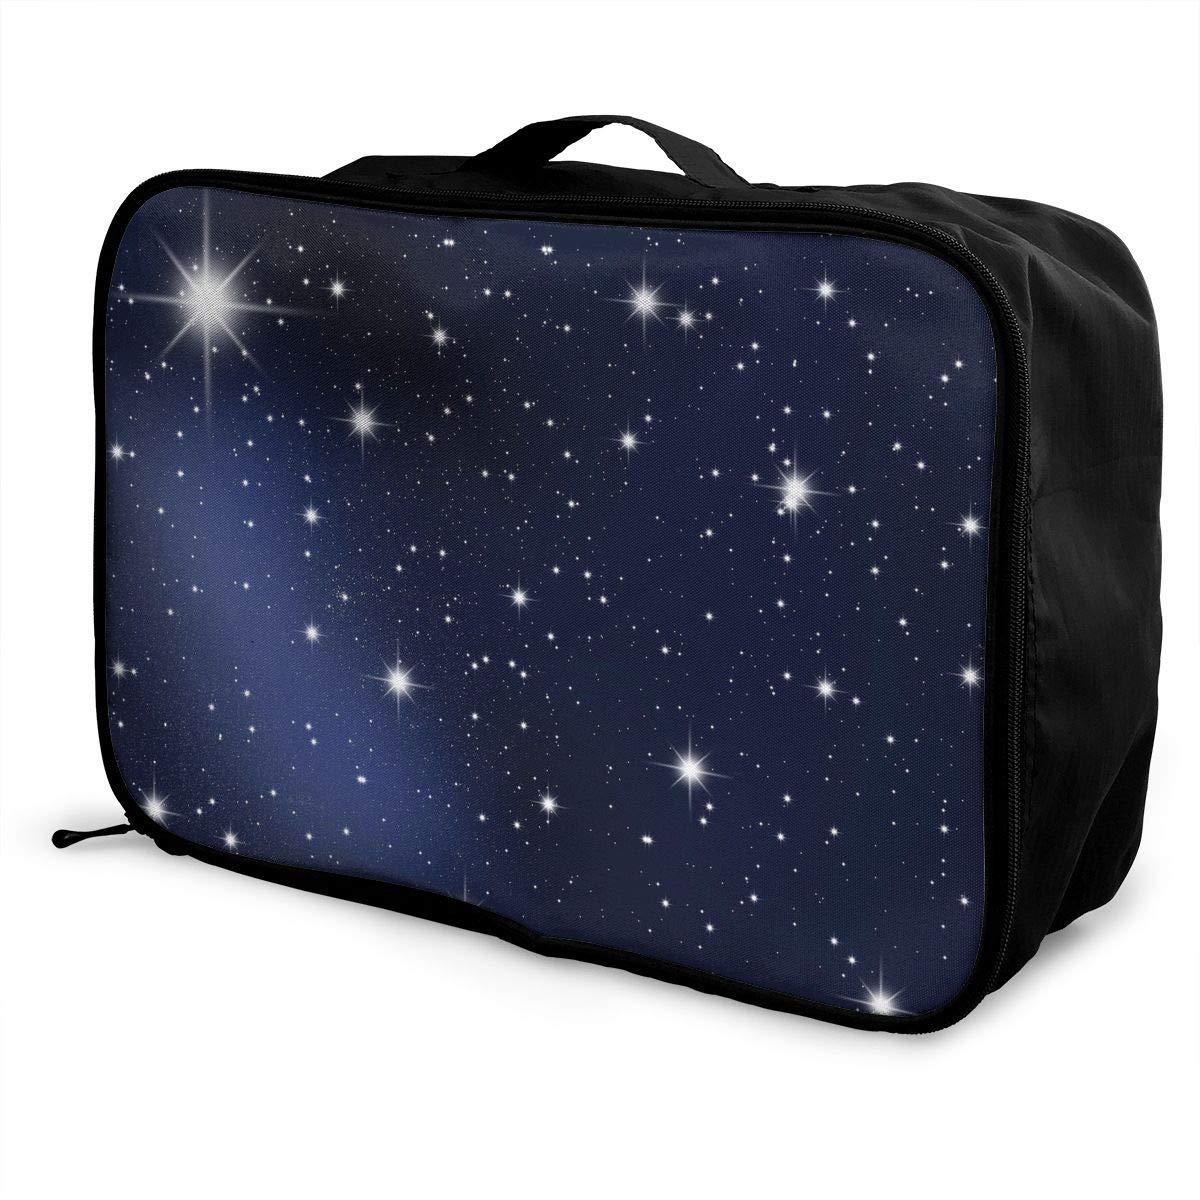 Travel Luggage Duffle Bag Lightweight Portable Handbag Starry Pattern Large Capacity Waterproof Foldable Storage Tote